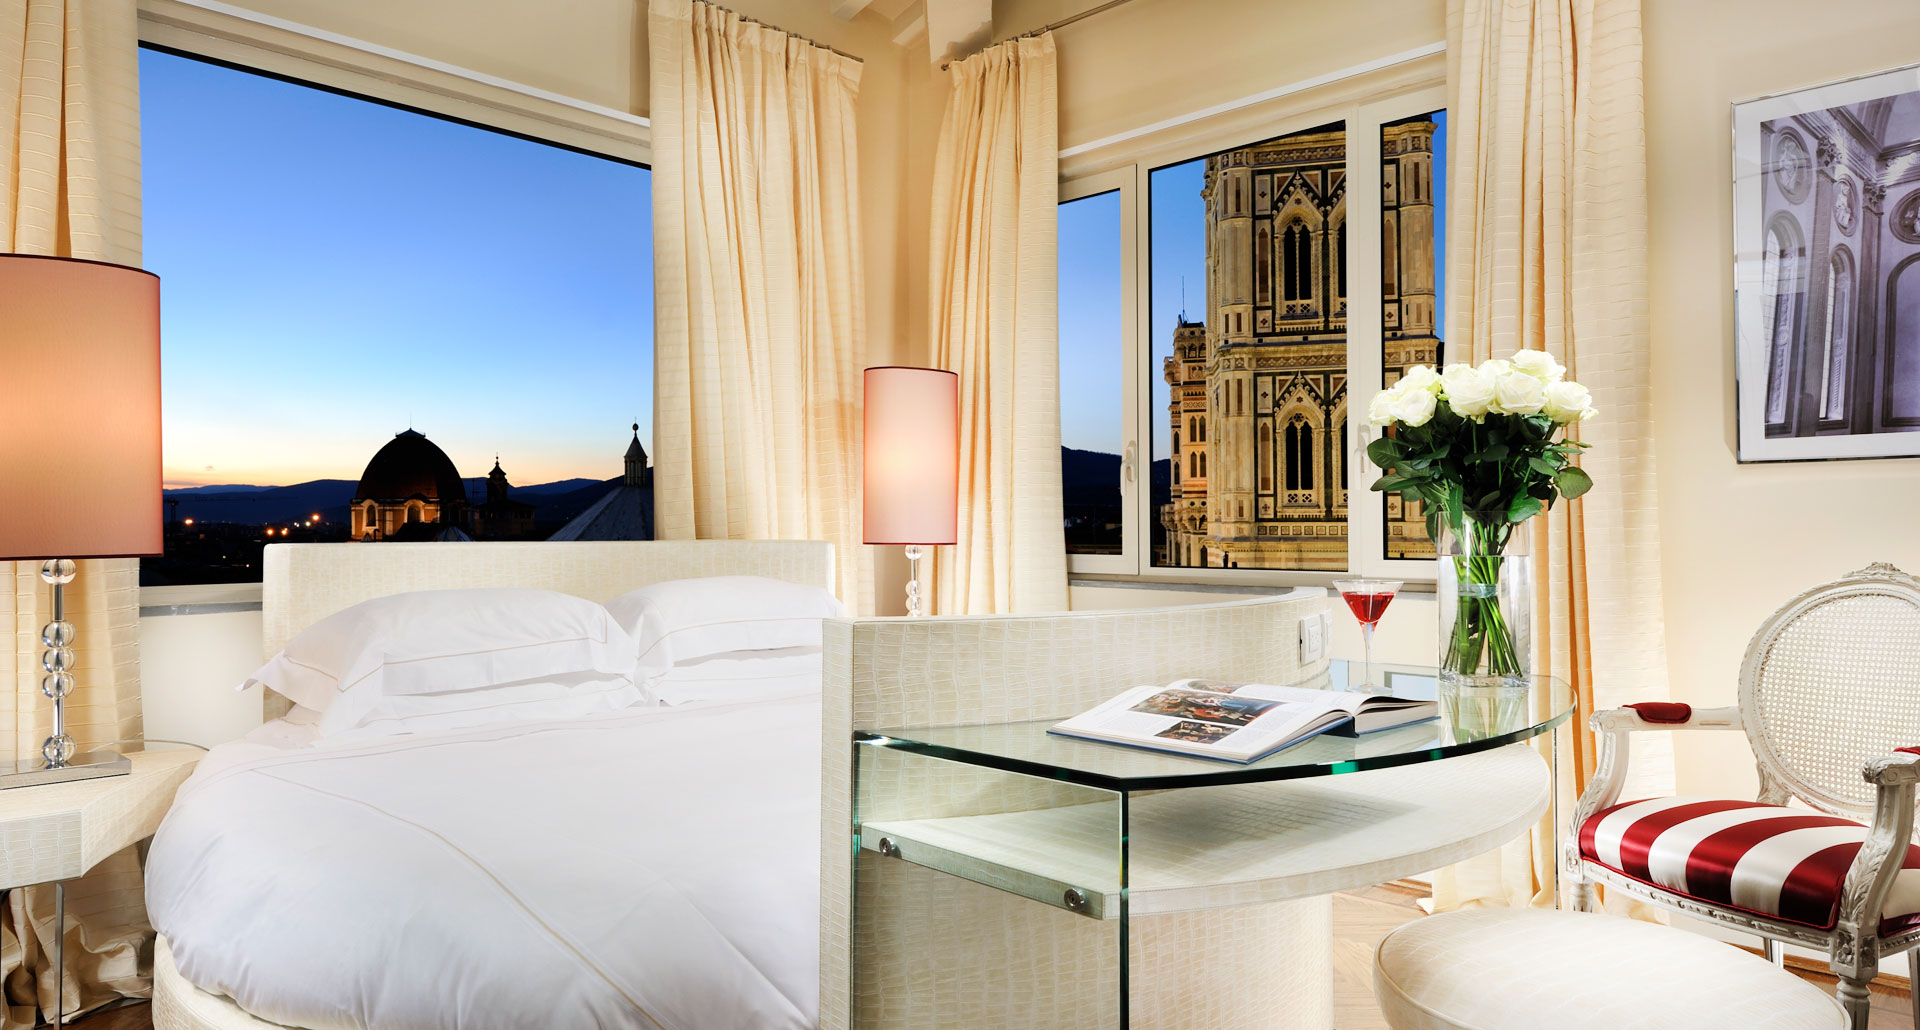 Hotel Brunelleschi - boutique hotel in Firenze